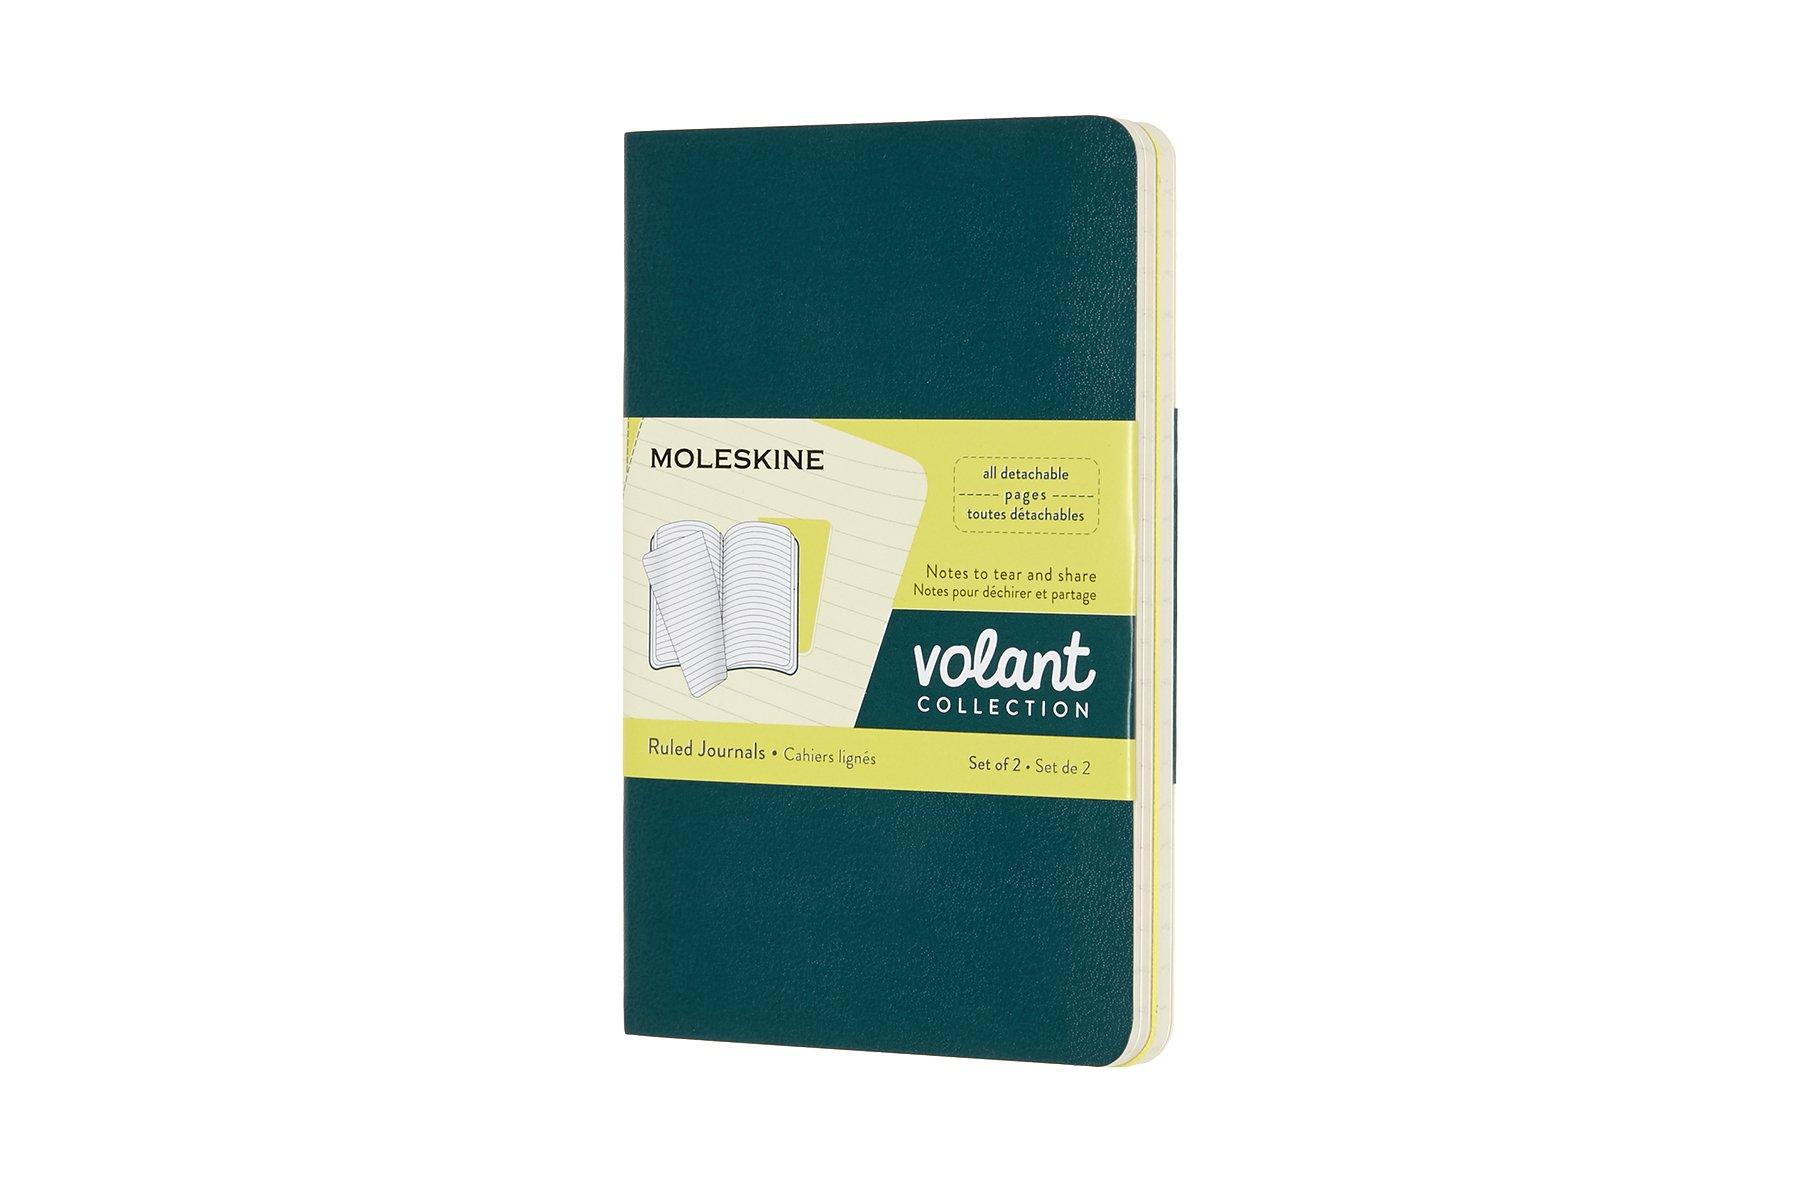 Moleskine Volant Soft Cover Journal, Set x 2, Ruled, Pocket